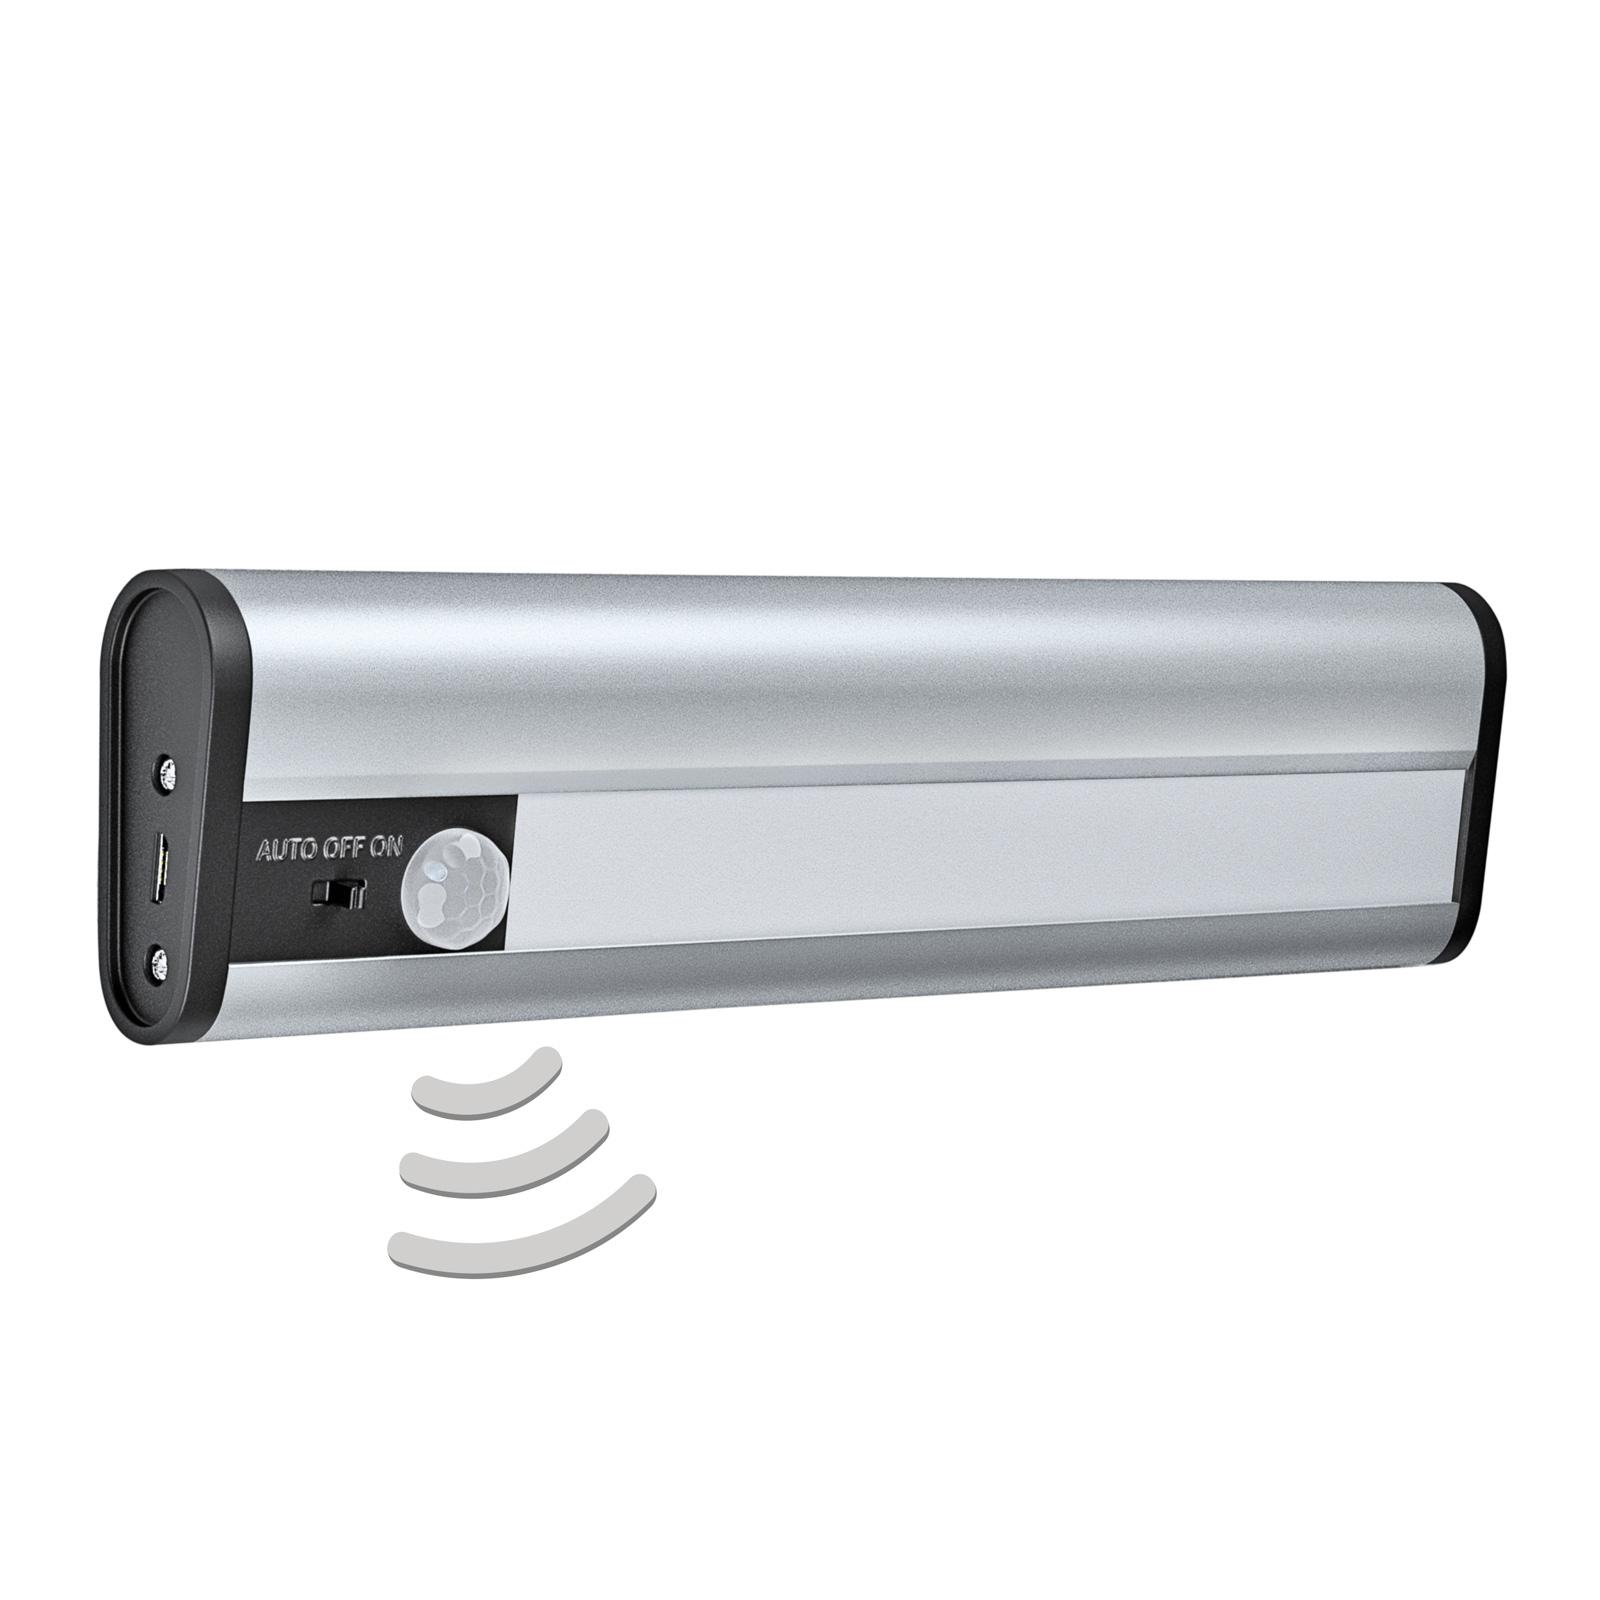 LEDVANCE Linear Mobile lampe sous meuble USB 20cm